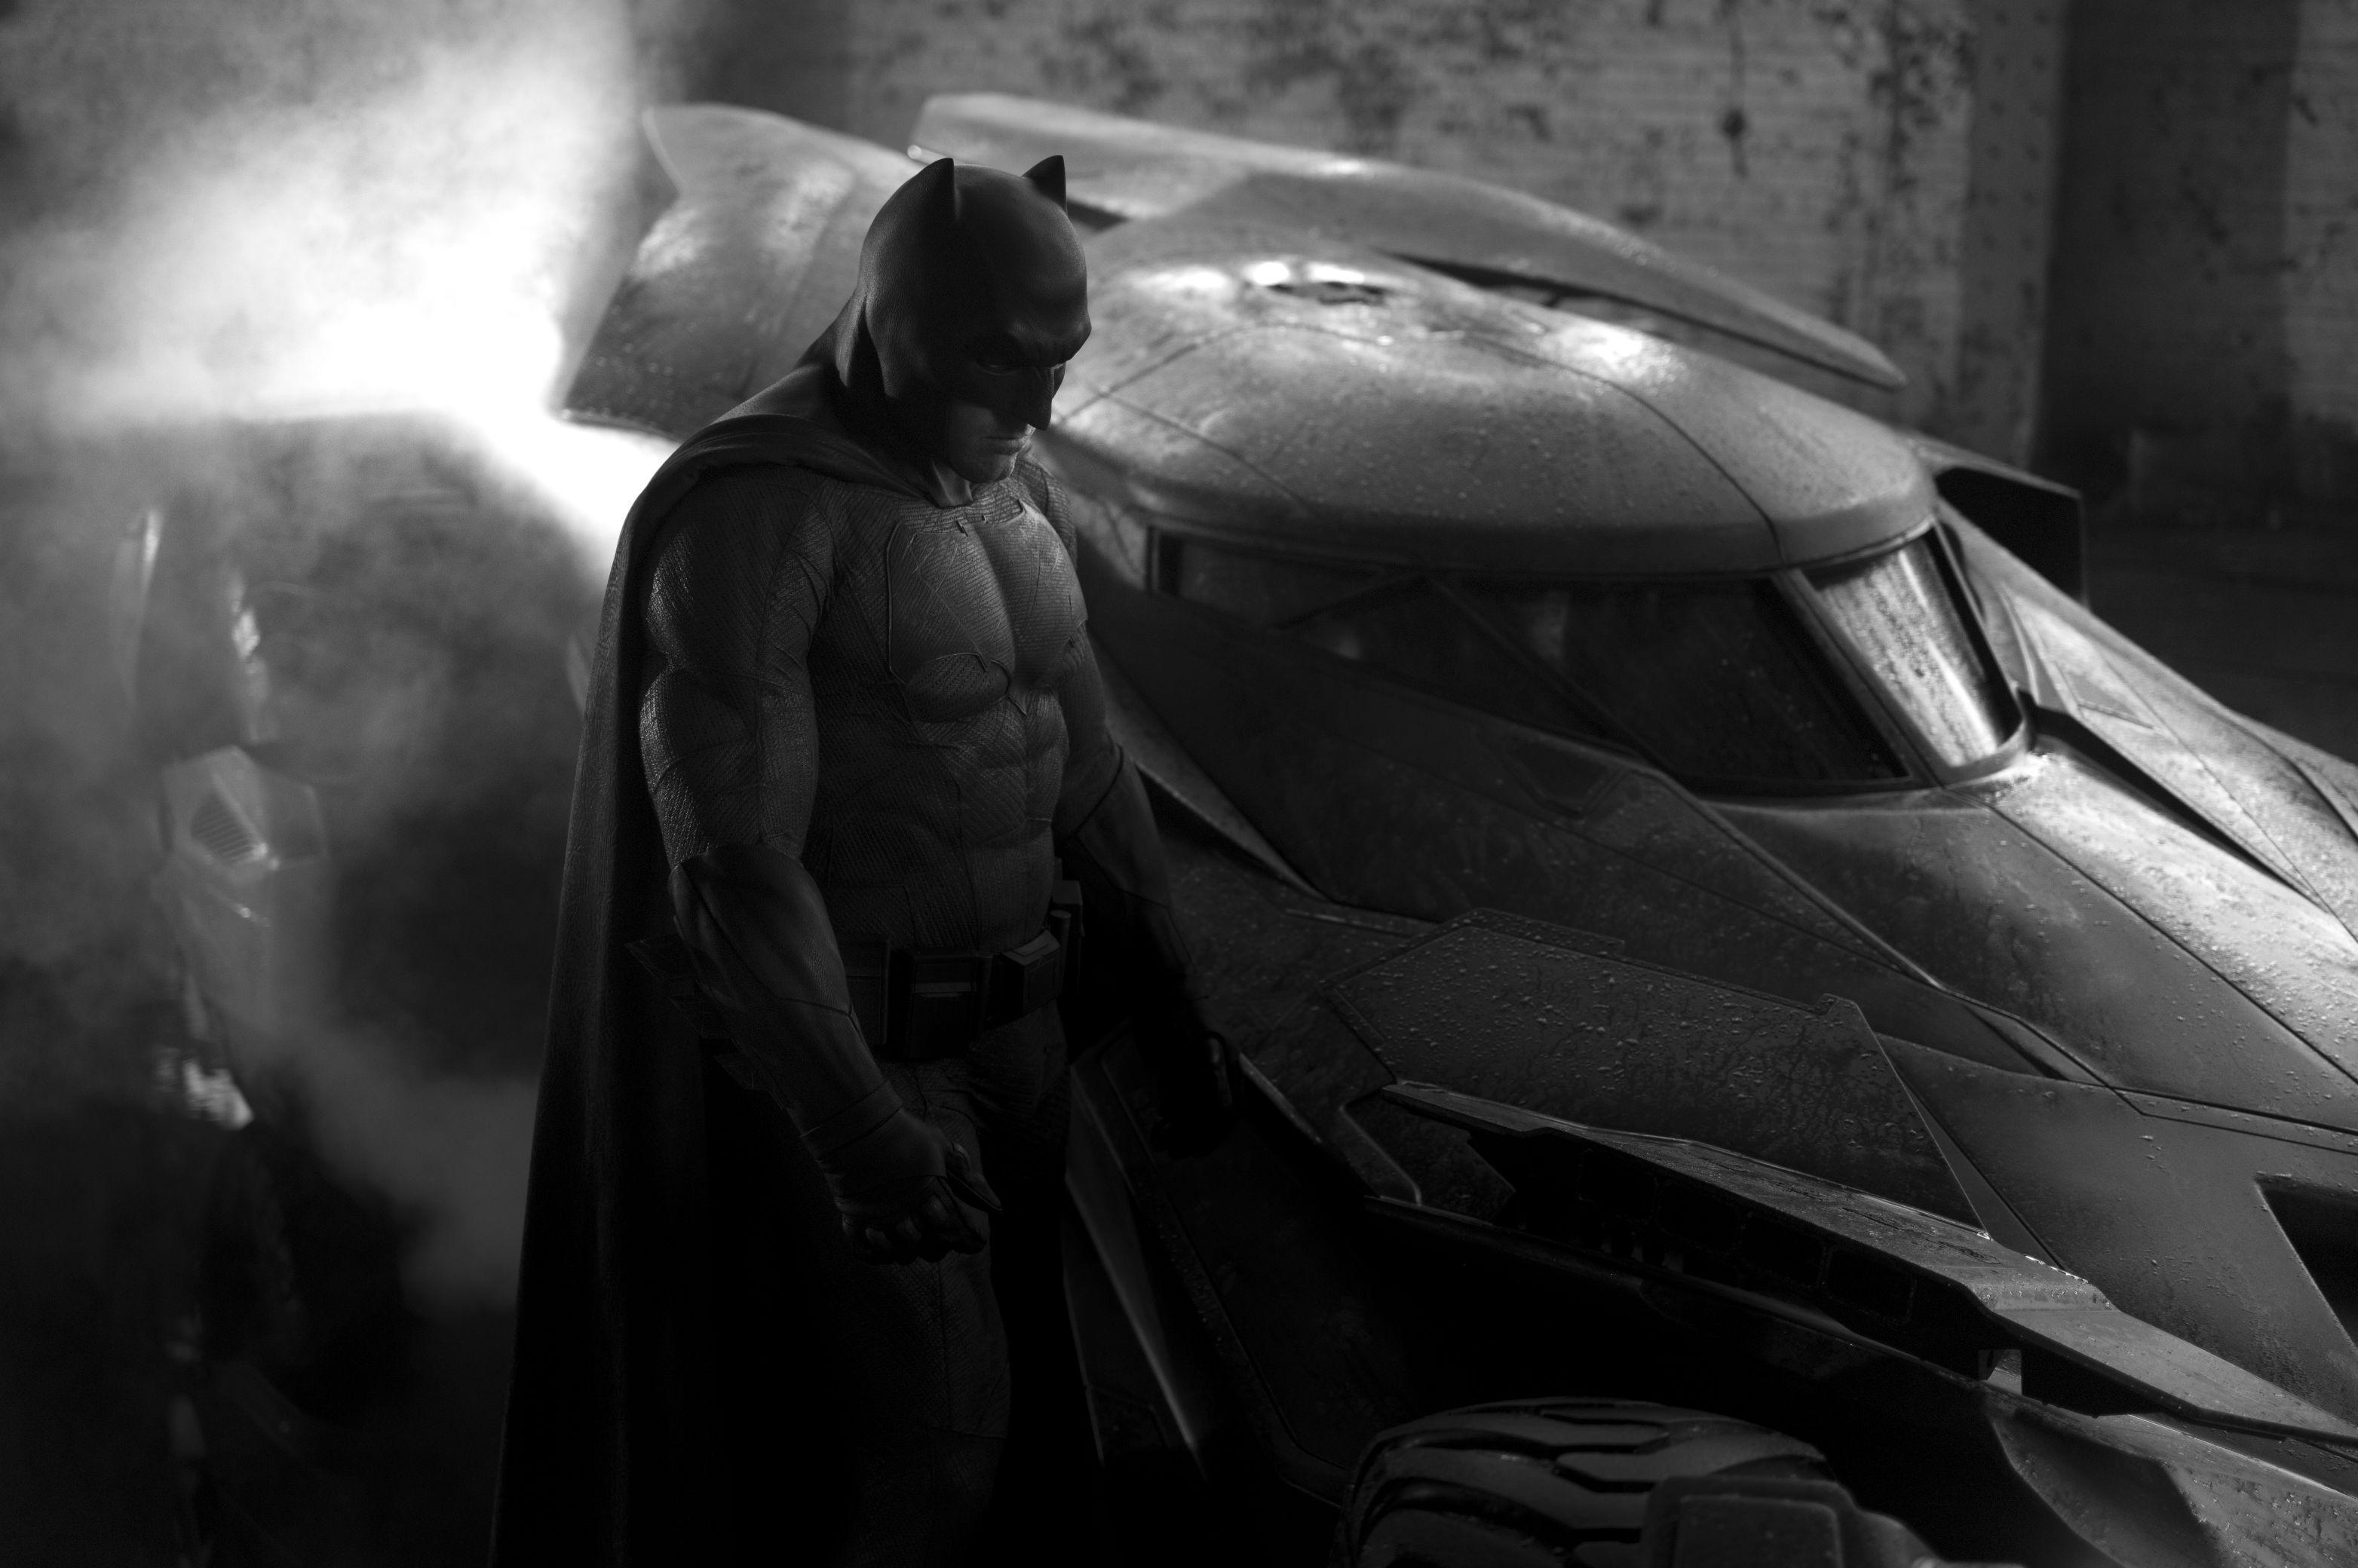 Batman Batmobile 3127x2080